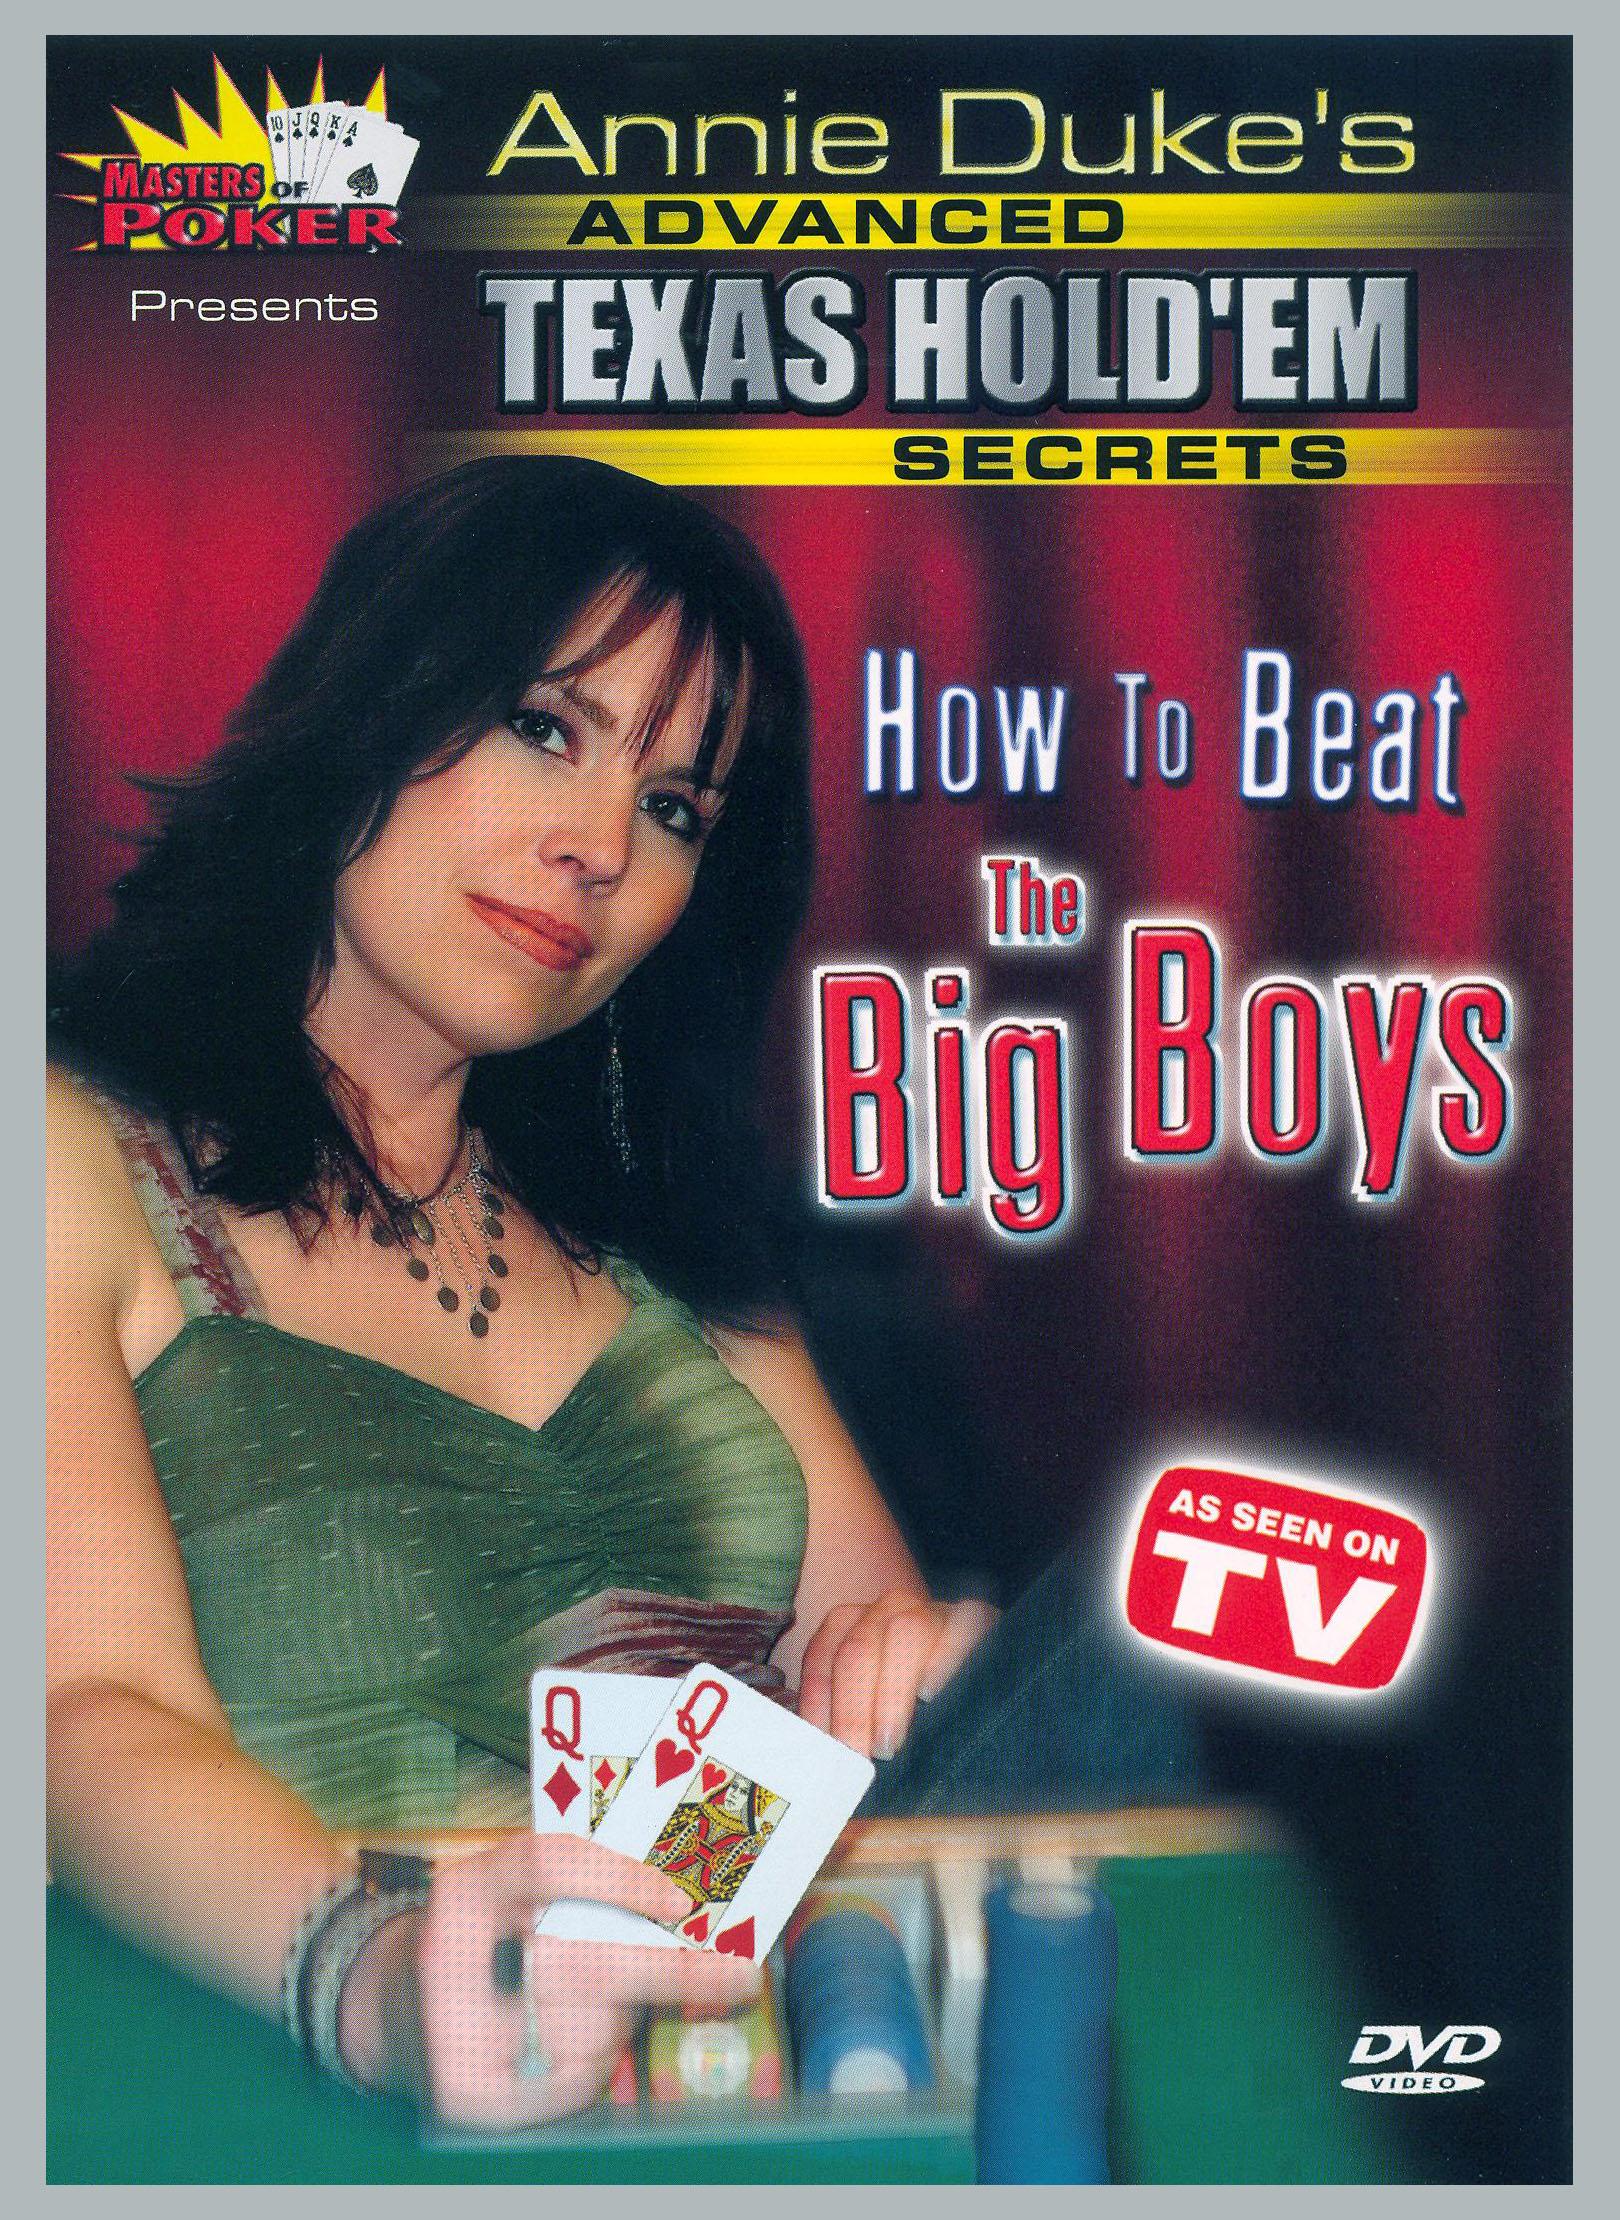 Masters of Poker: Annie Duke's Advanced Texas Hold-em